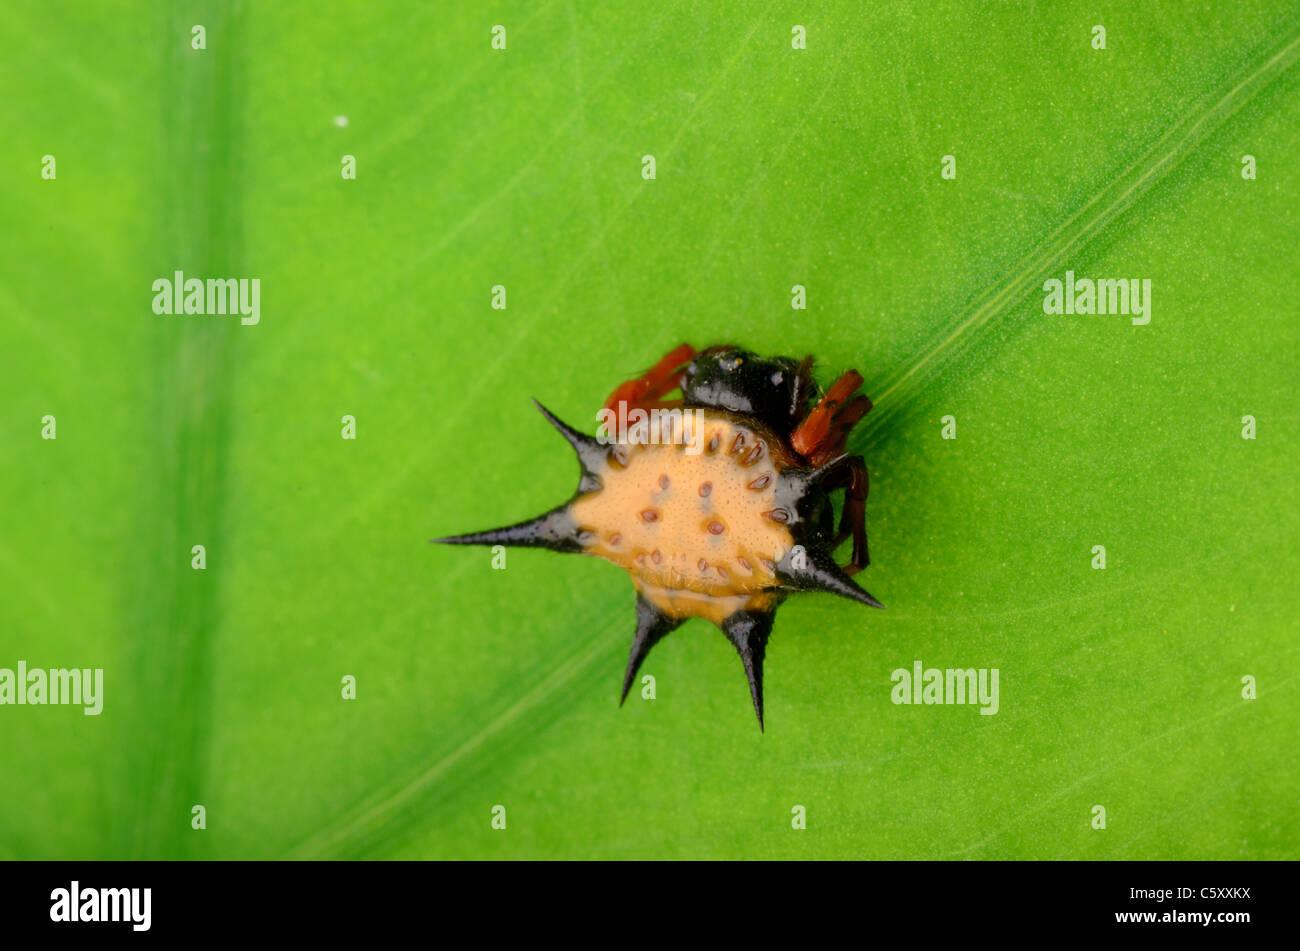 spiny spider spinybacked orbweaver on leaf - Stock Image